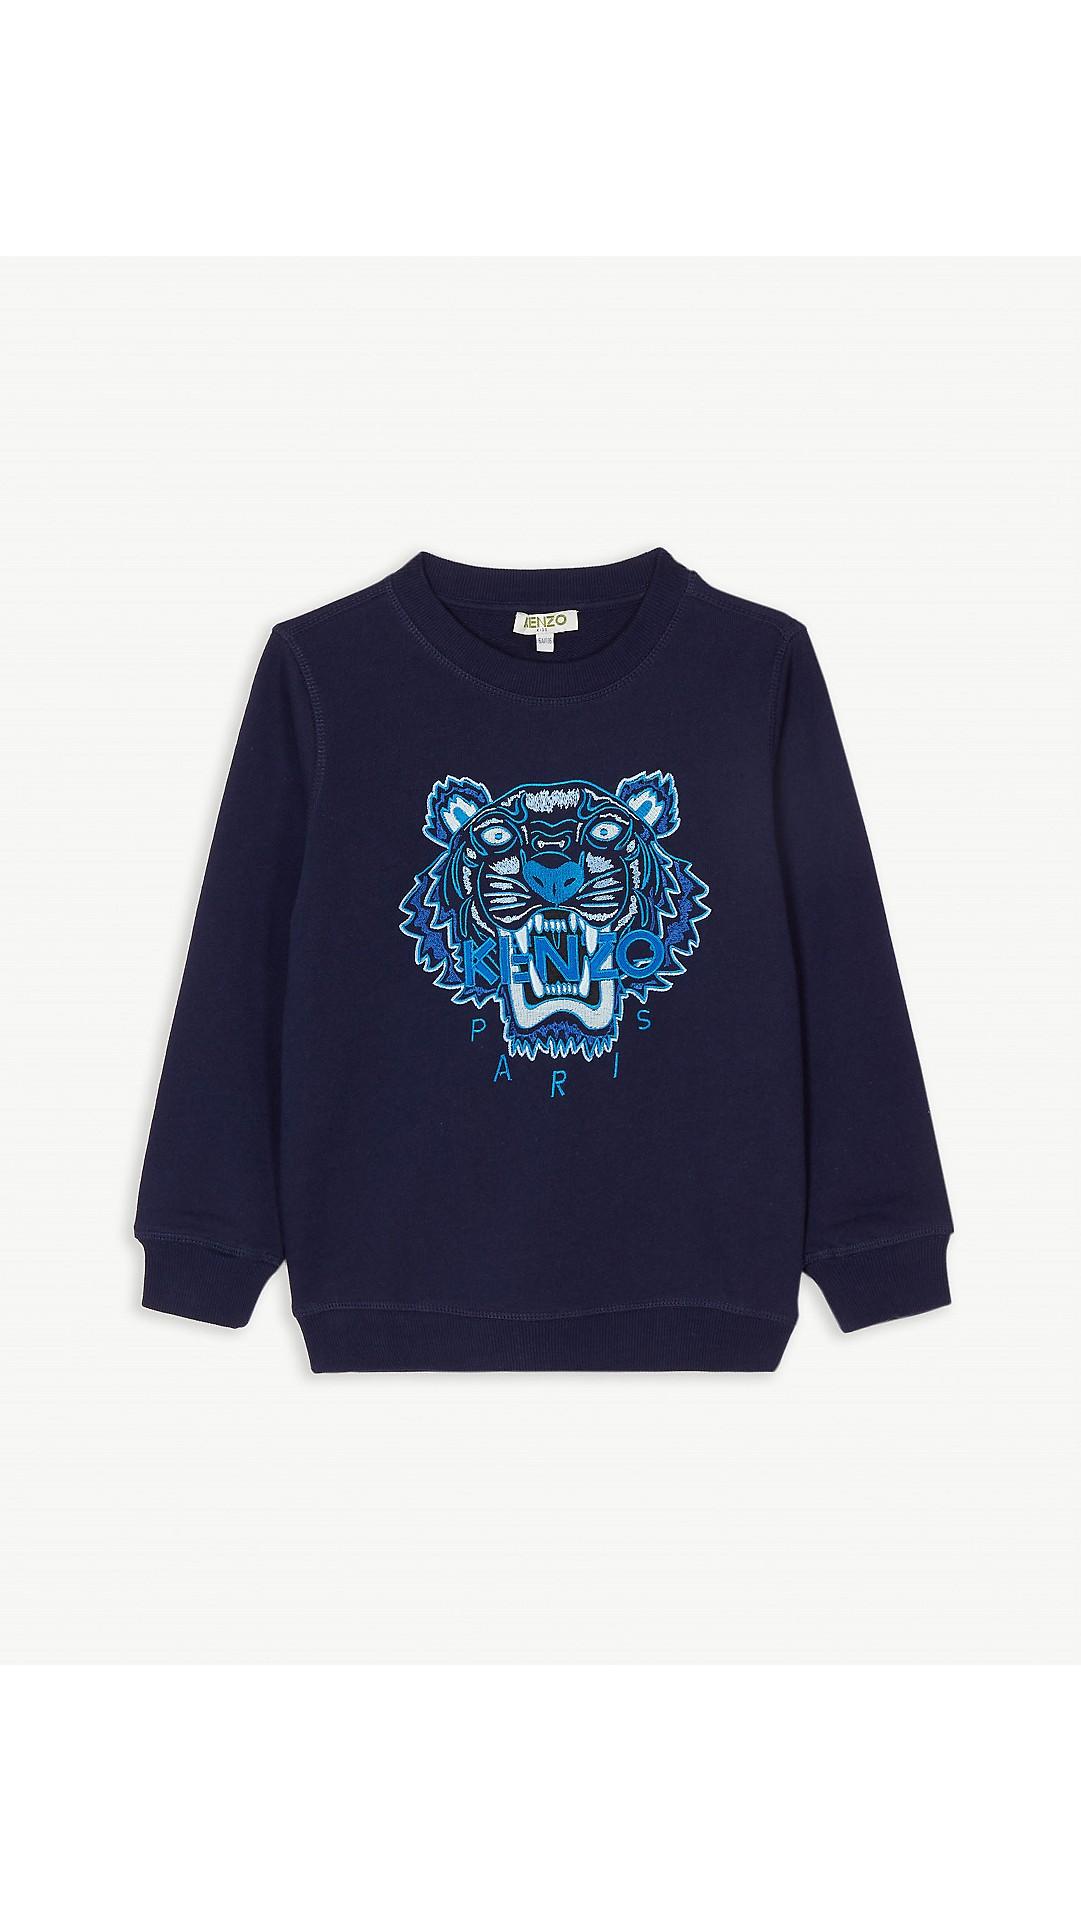 d97d47ad2 KENZO - Icon tiger motif cotton sweatshirt (4-14 years) | Selfridges.com